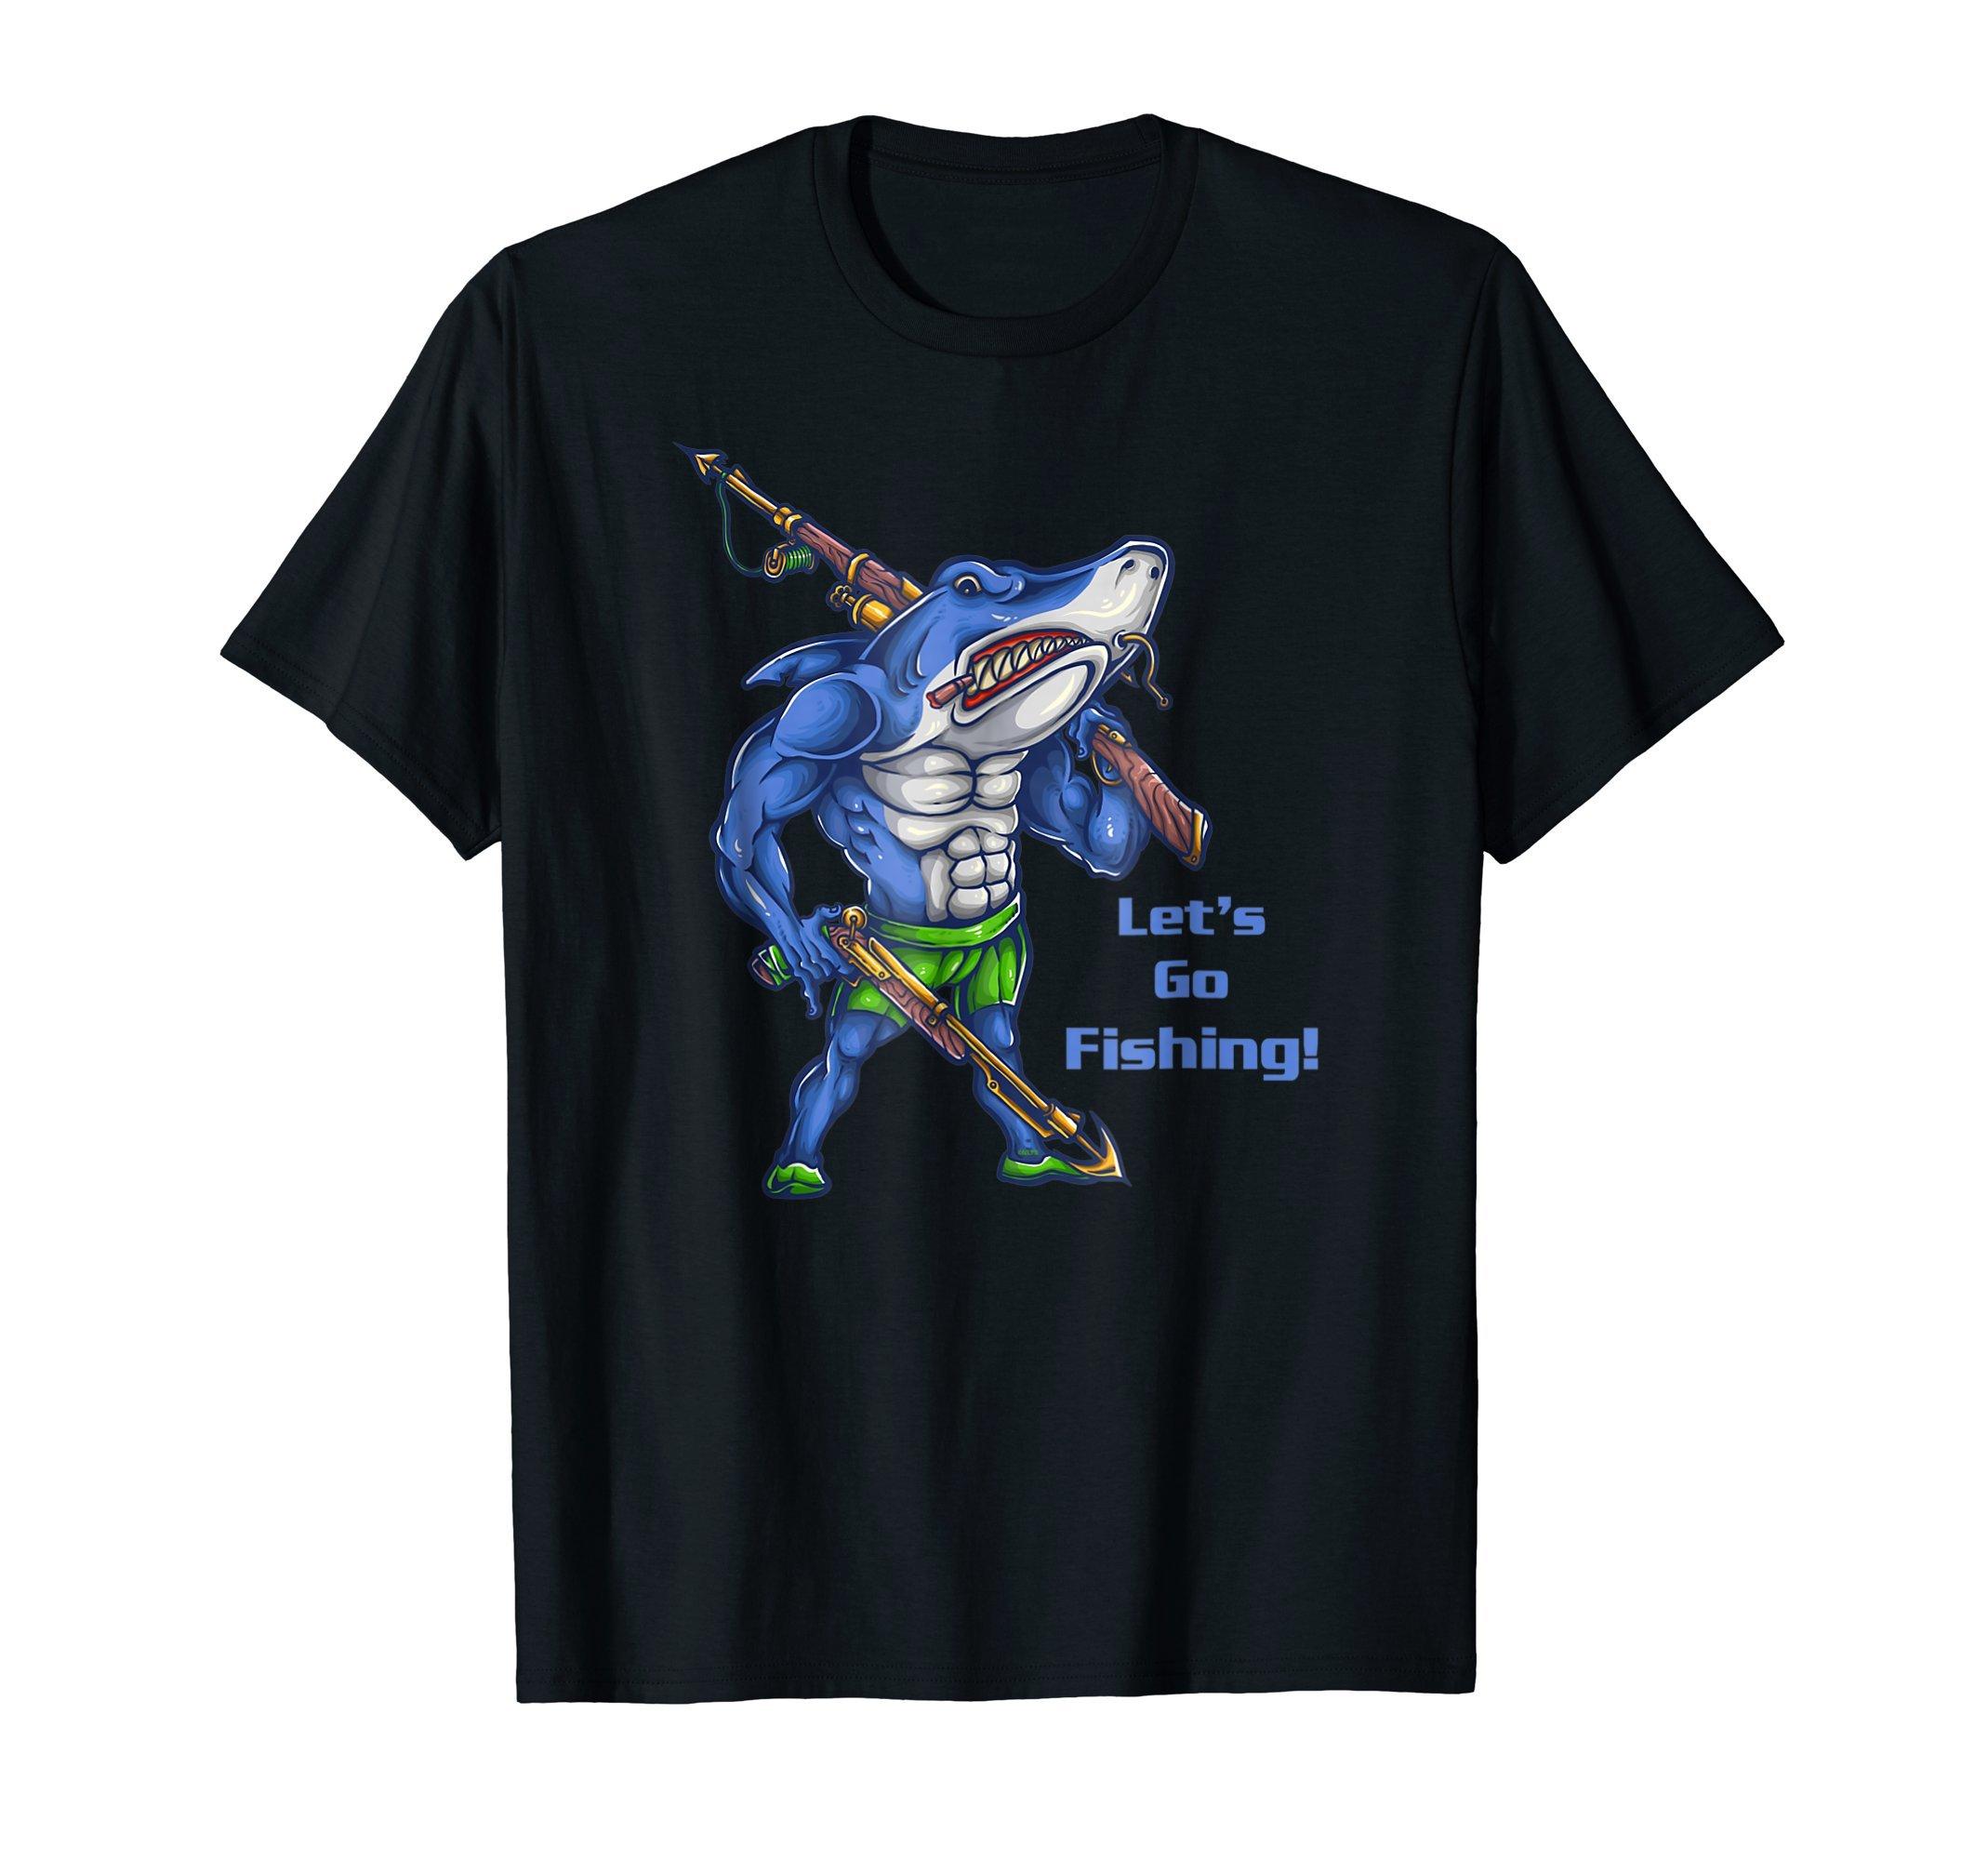 Lets-go-fishing-Shark-Funny-Humor-T-Shirt-Shirt-Tee-Gift